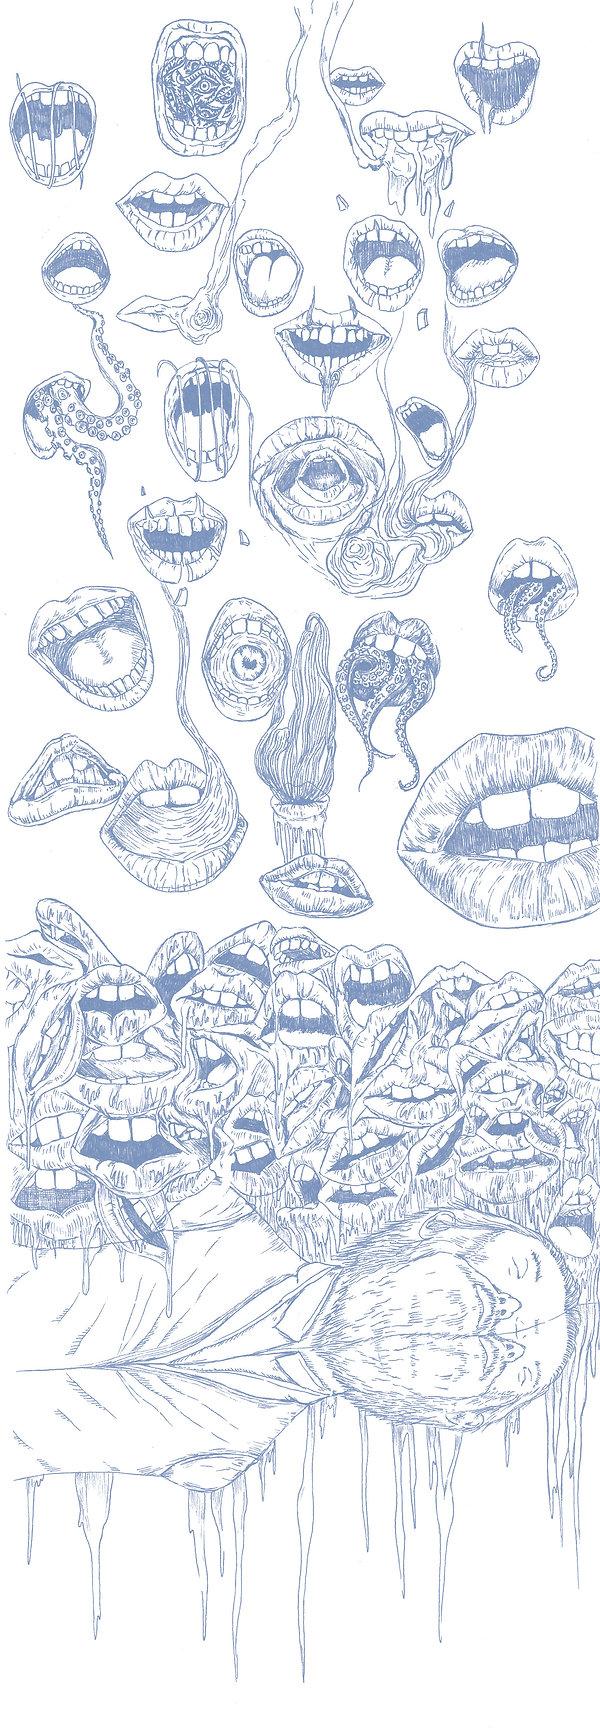 mouths2.jpg